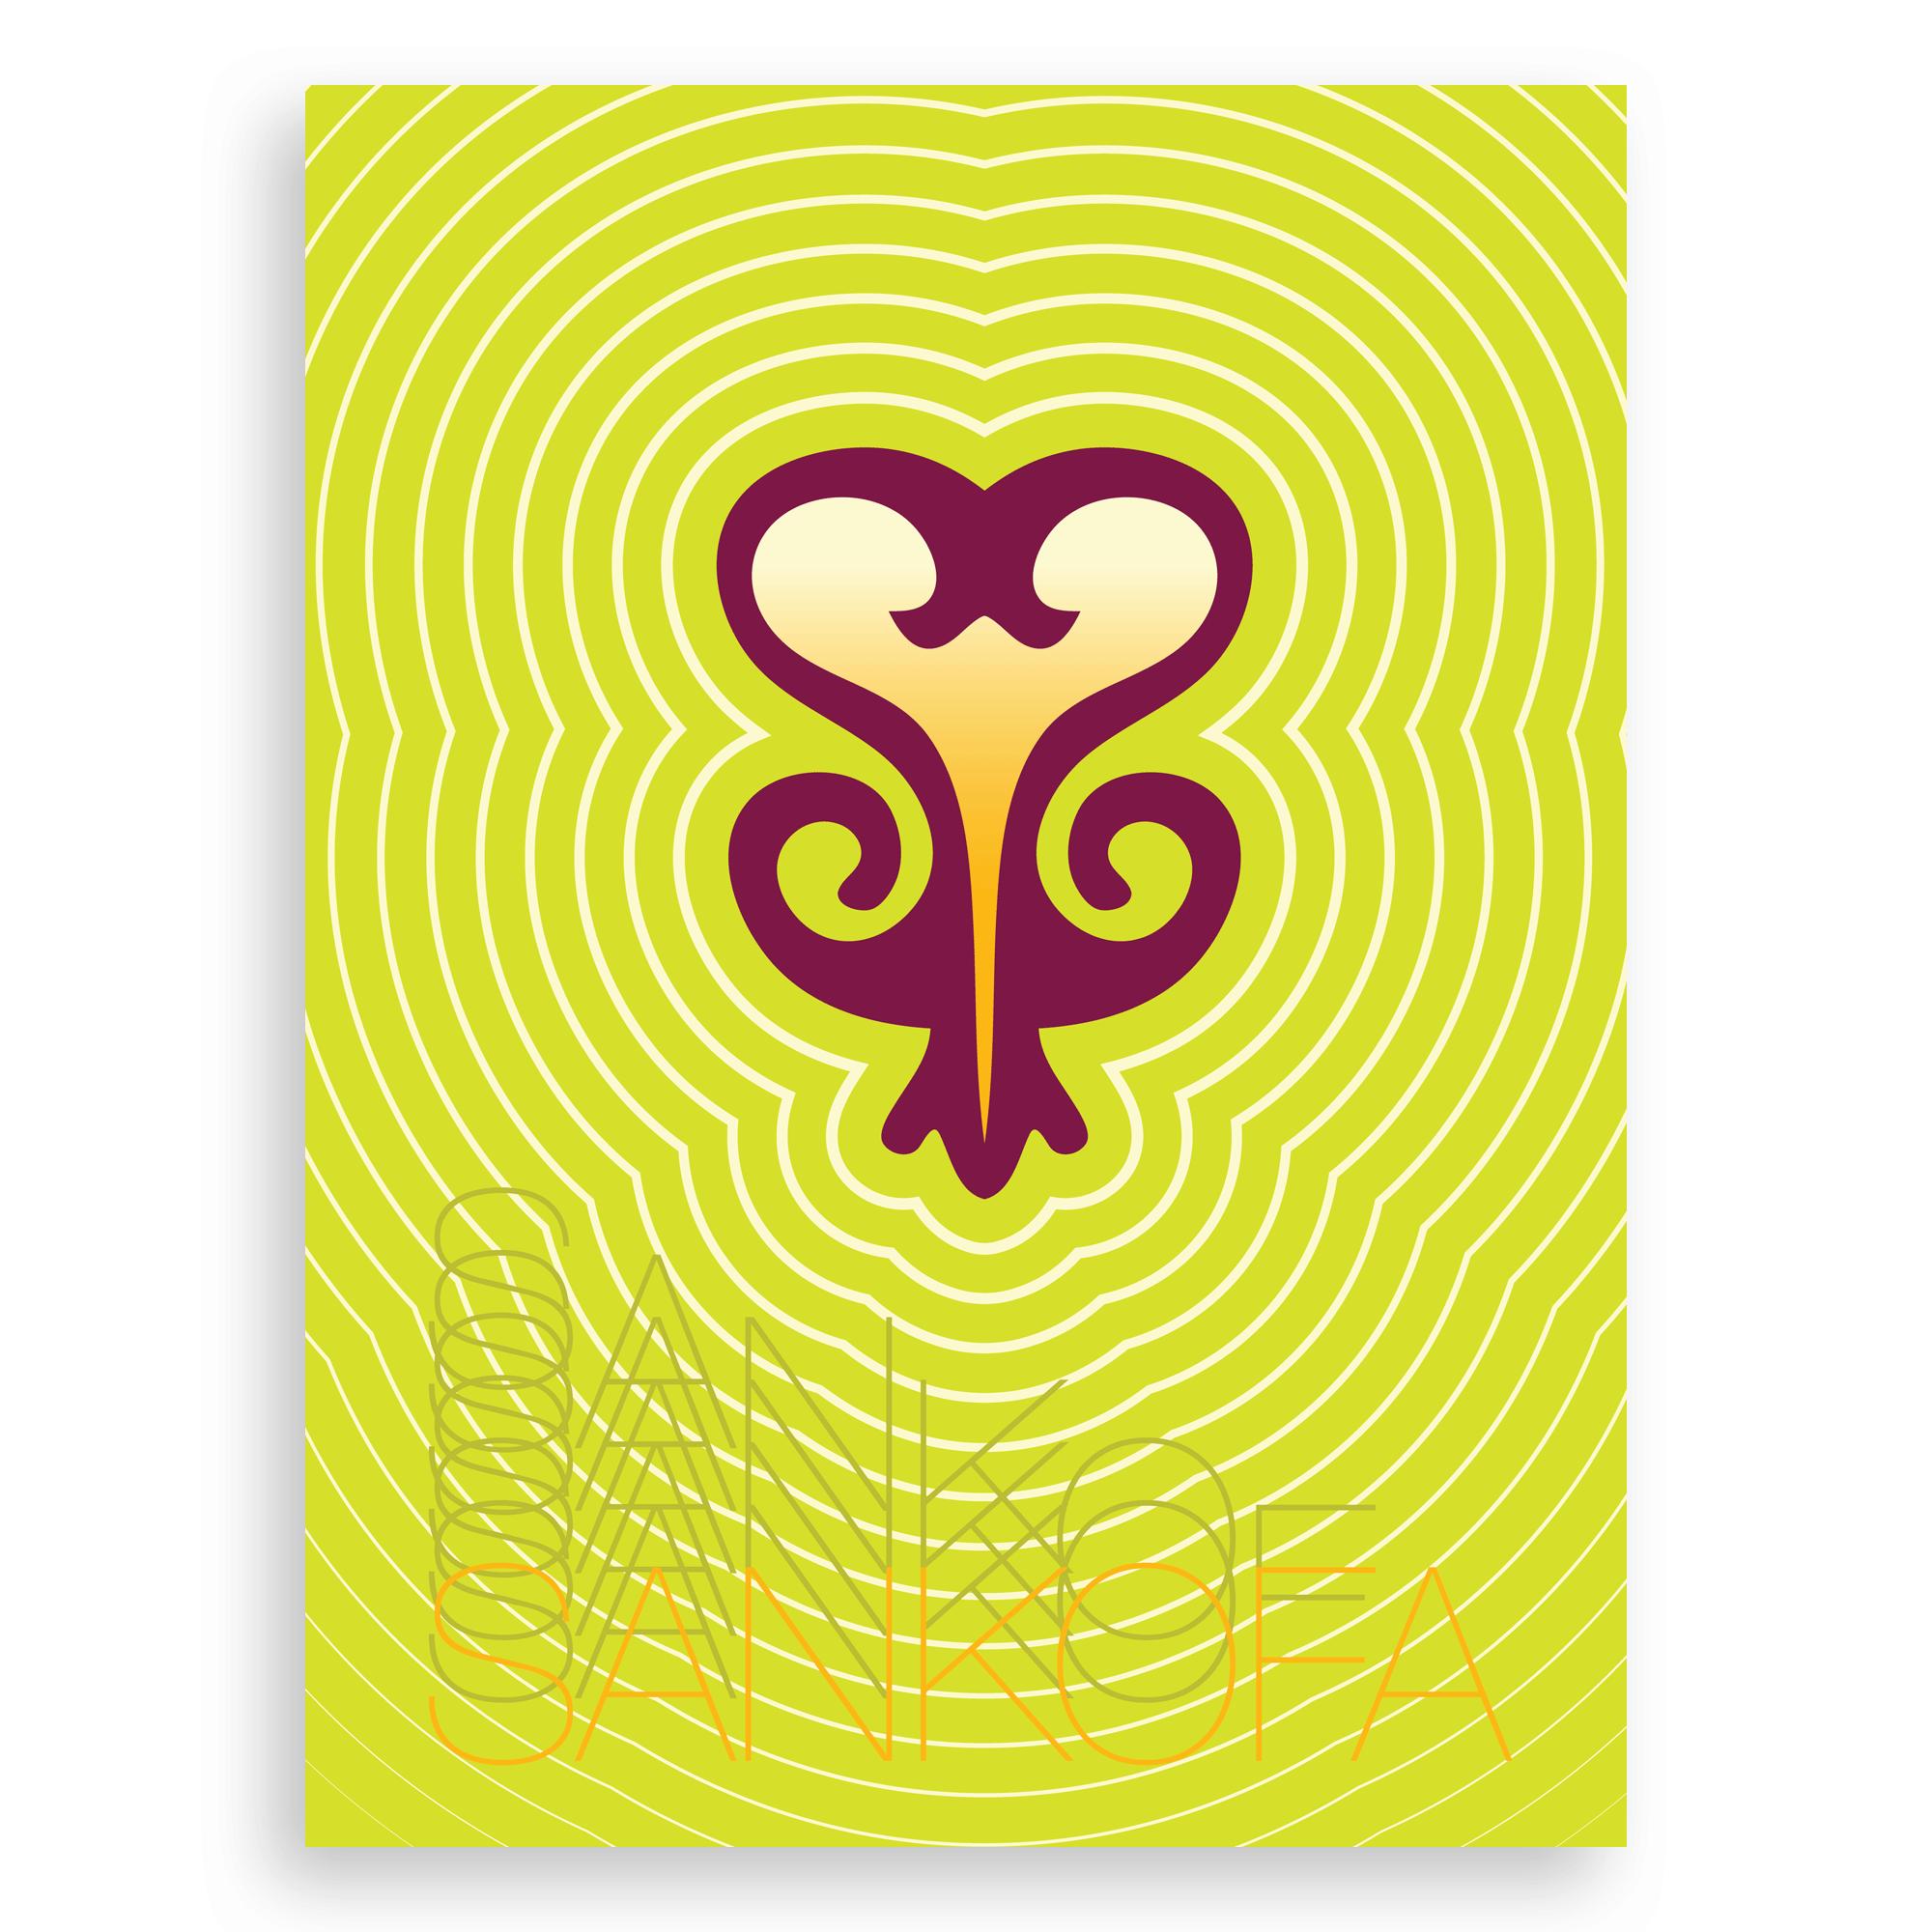 Sankofa Graphic Print – (Past Wisdom, Present Action)